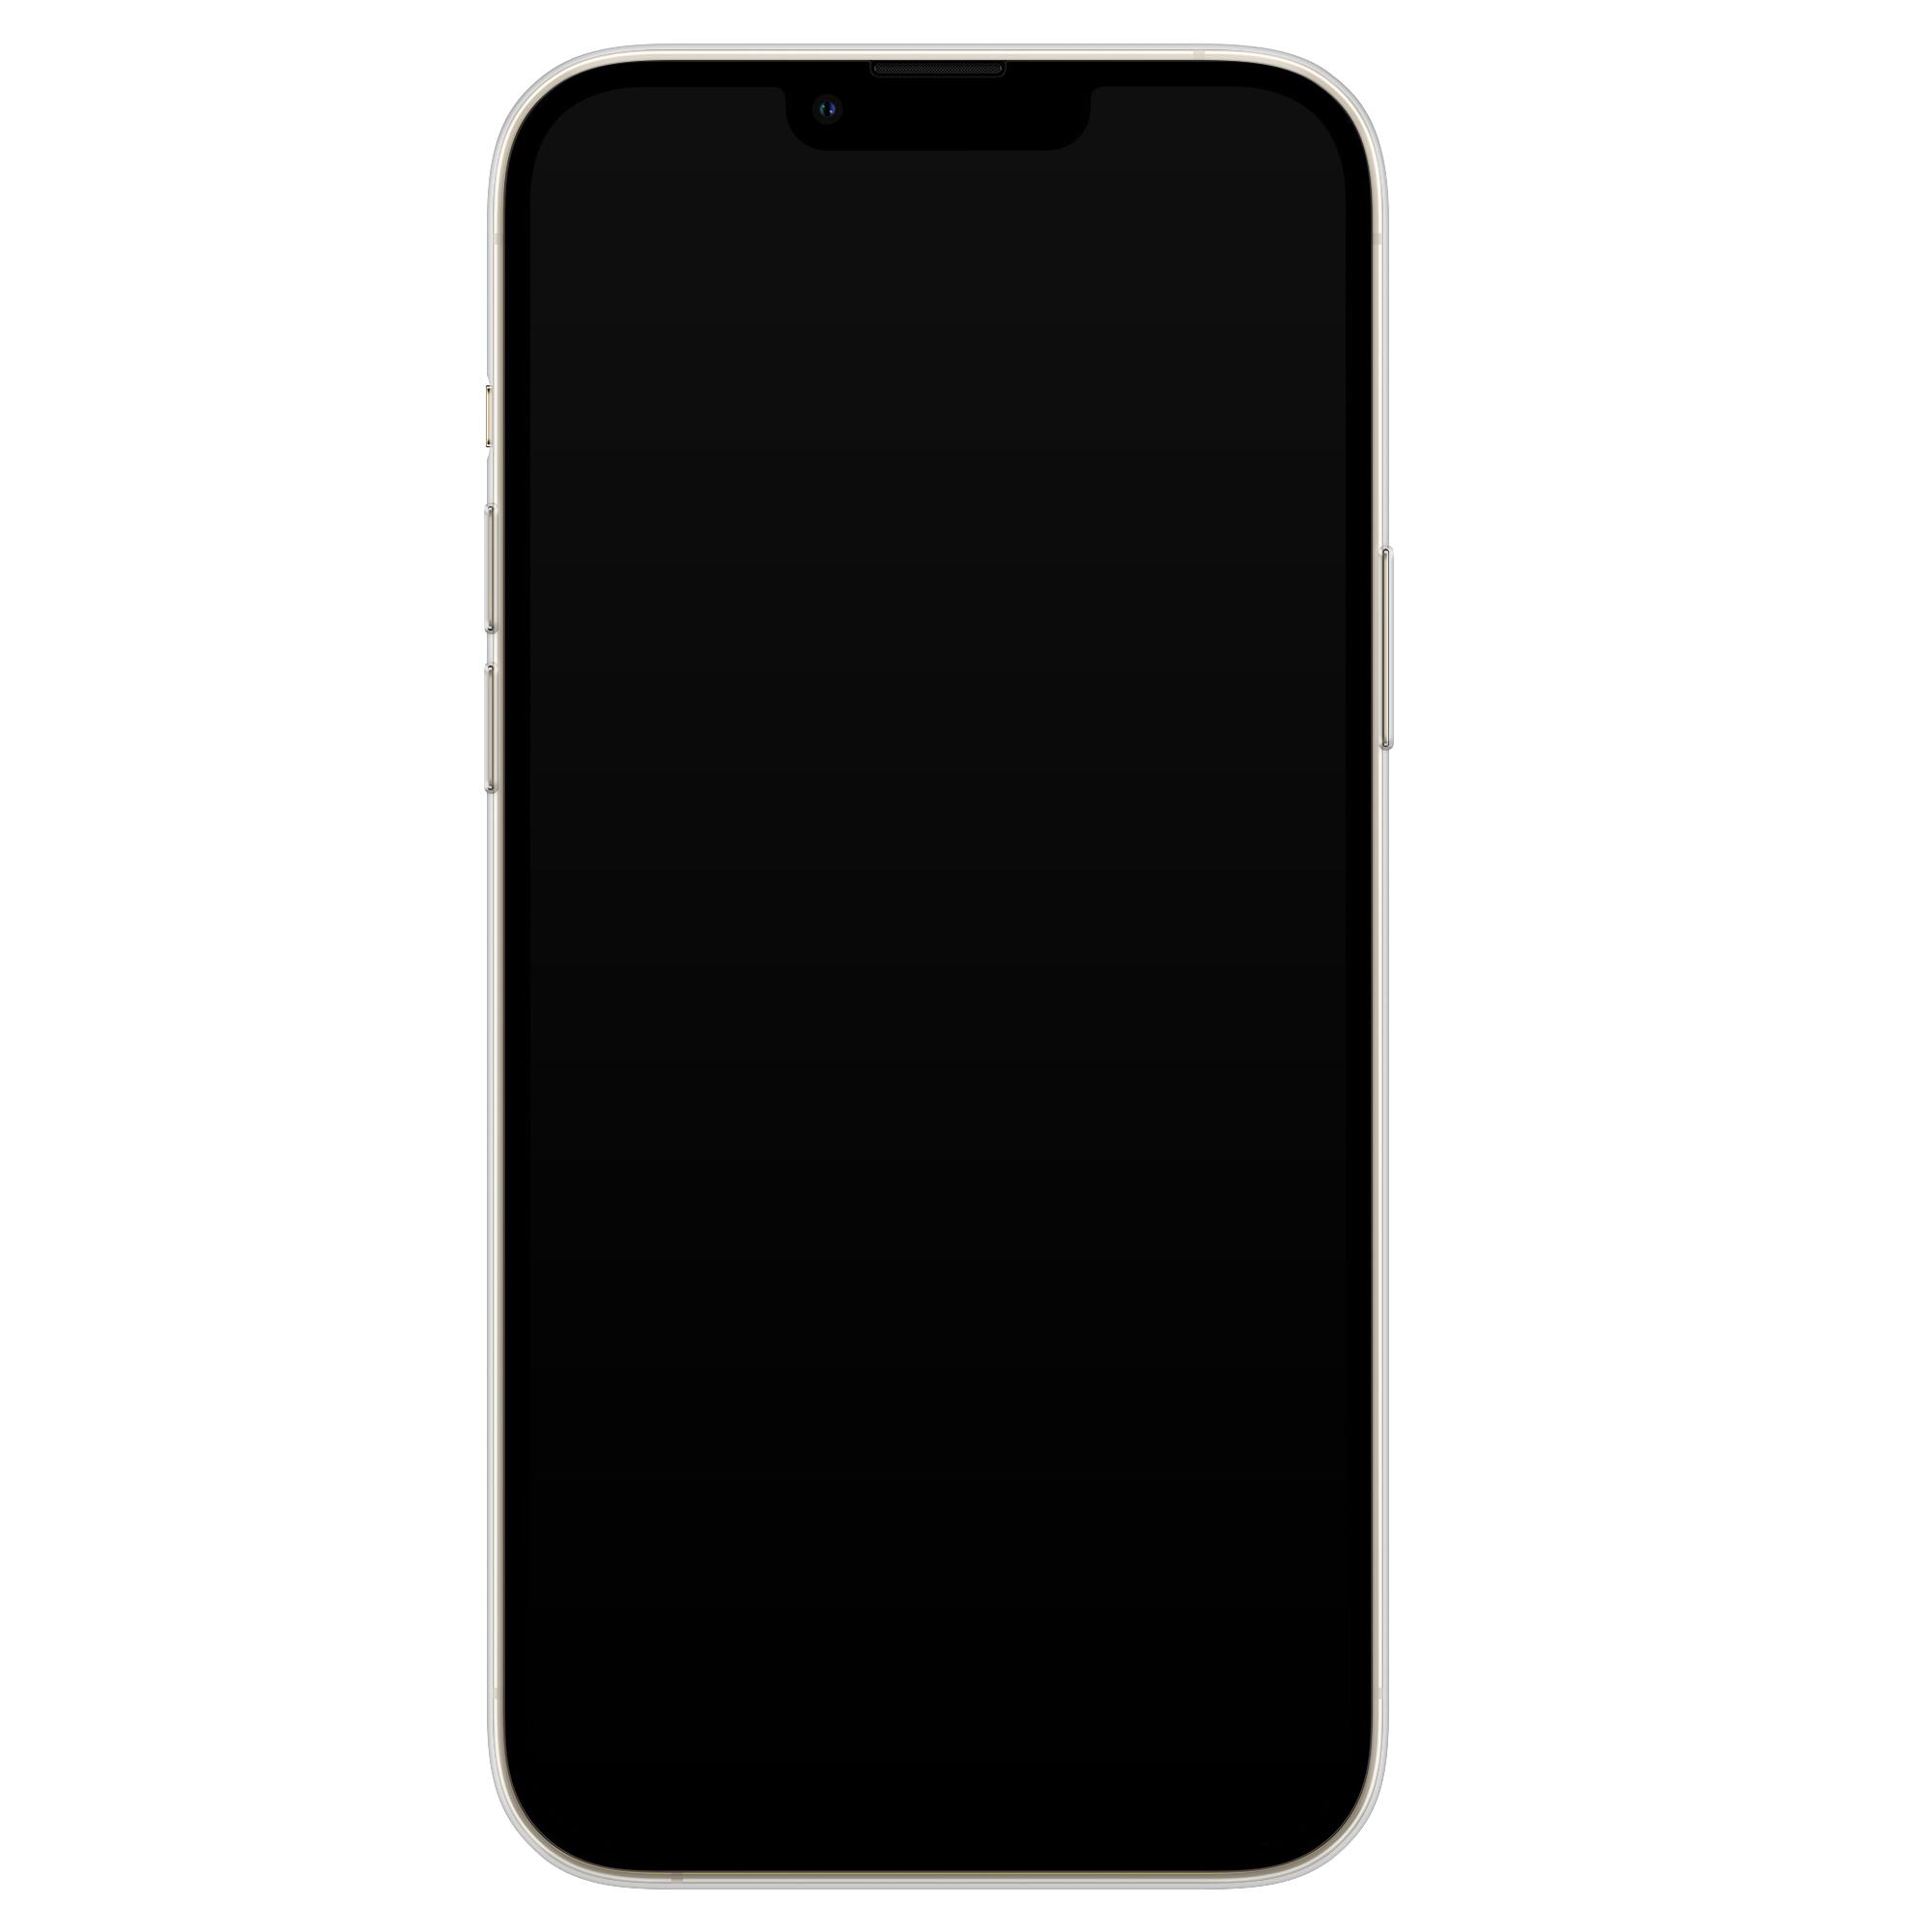 Leuke Telefoonhoesjes iPhone 13 Pro Max siliconen hoesje - Bee happy